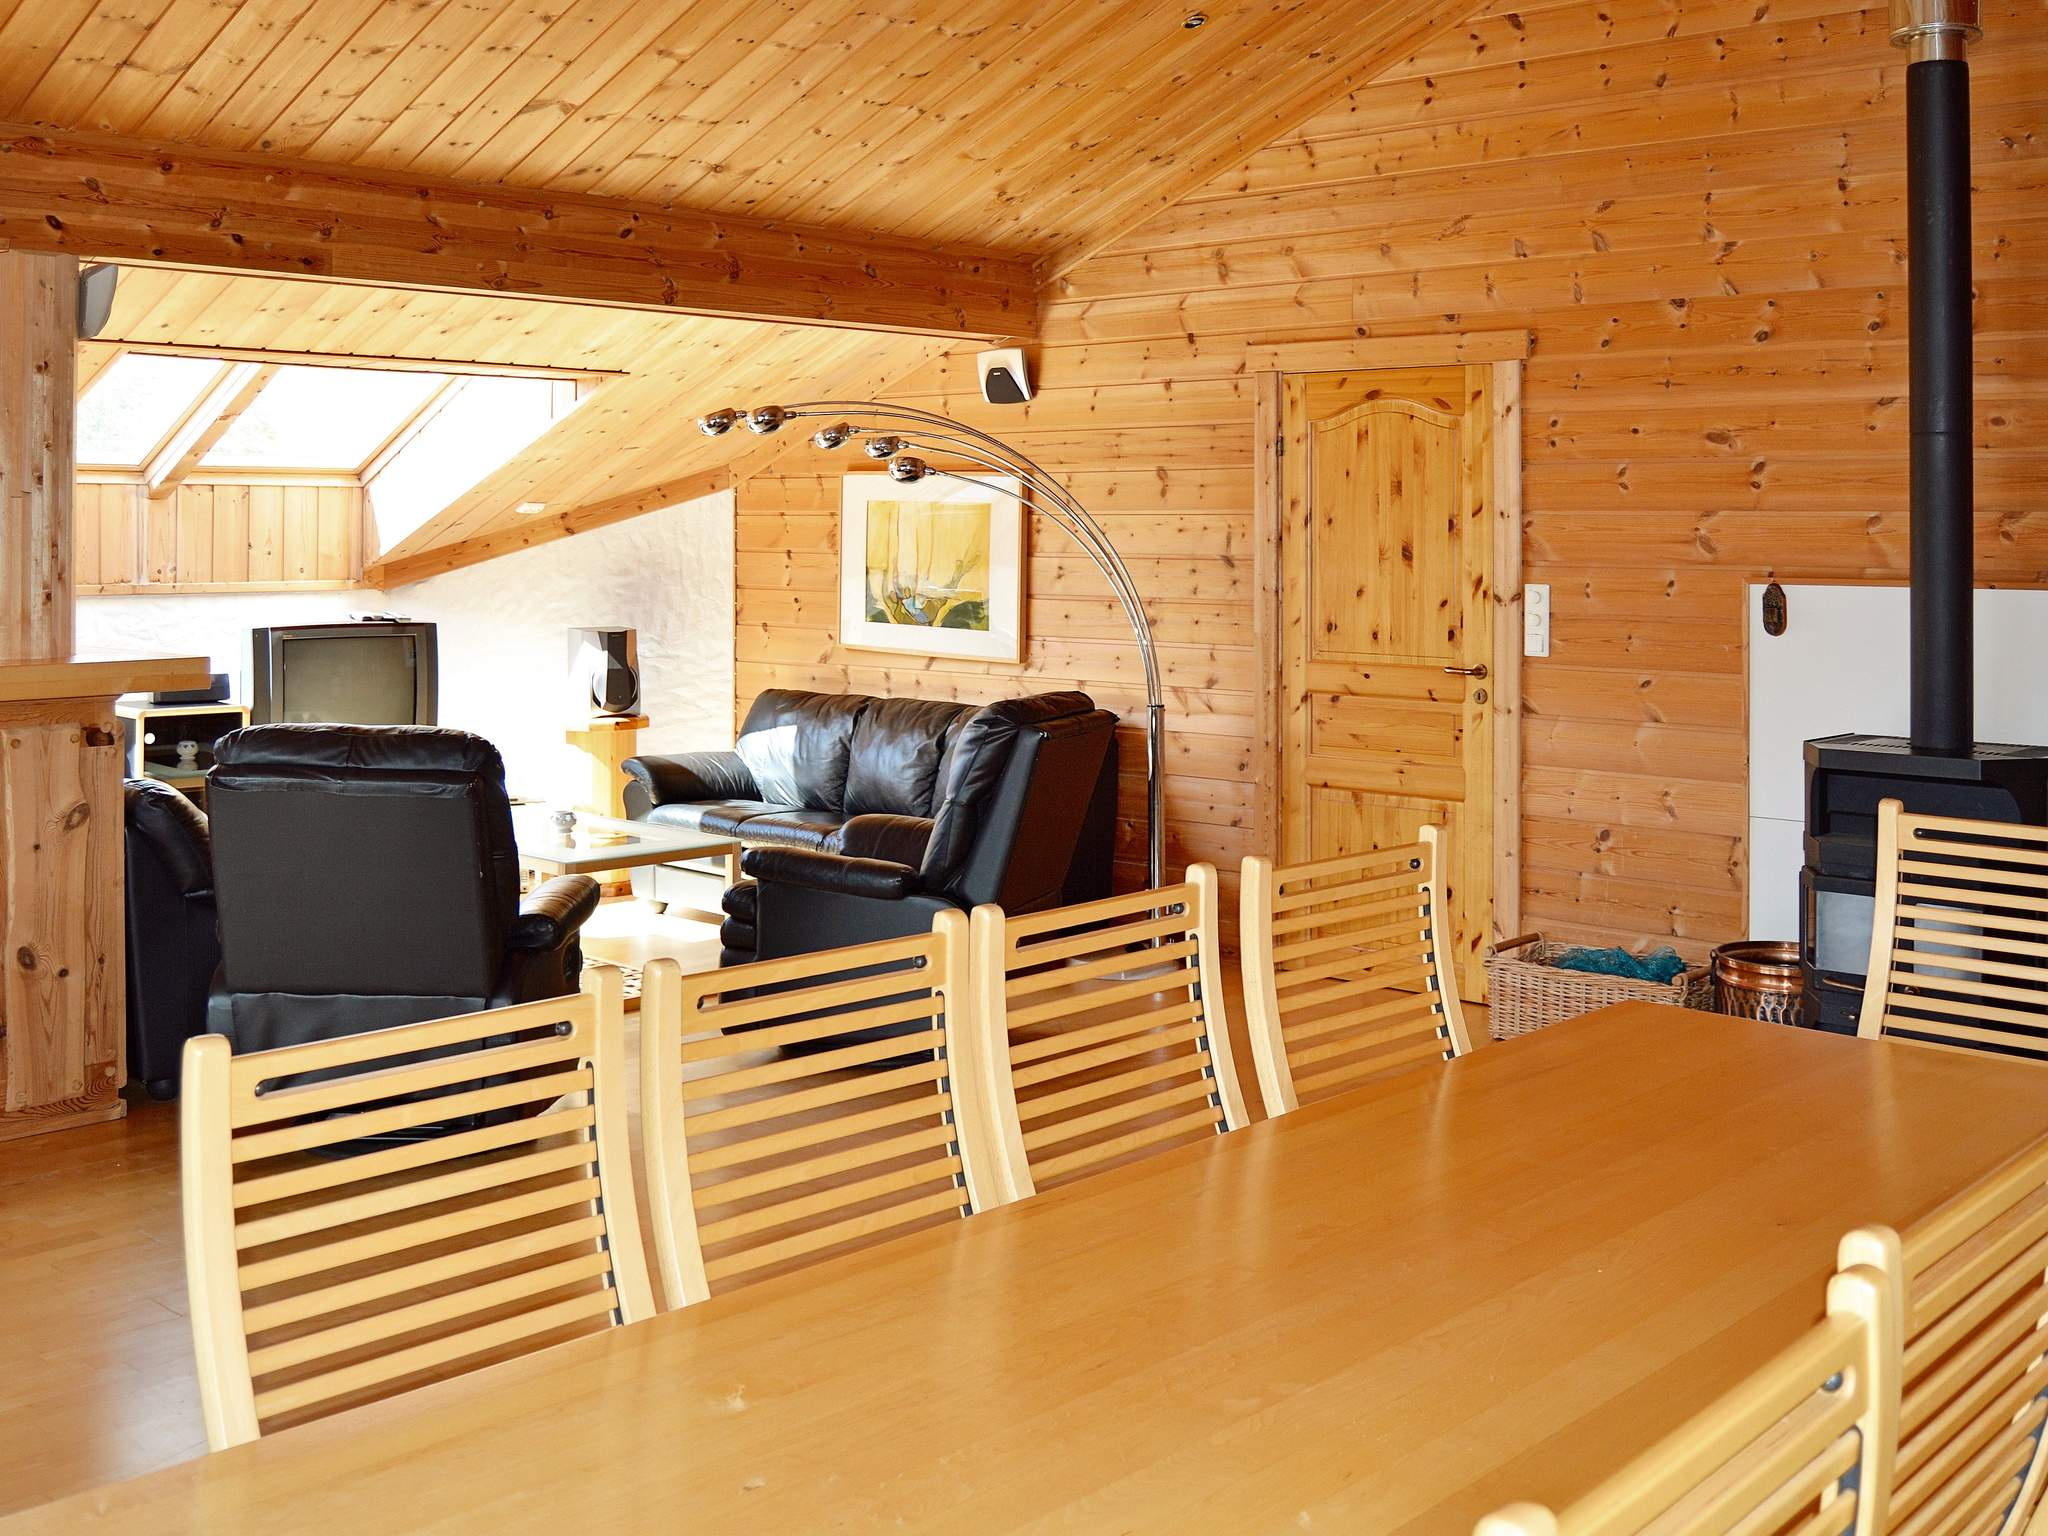 Ferienhaus Eidsvåg (84695), Eidsvåg, More - Romsdal, Westnorwegen, Norwegen, Bild 5